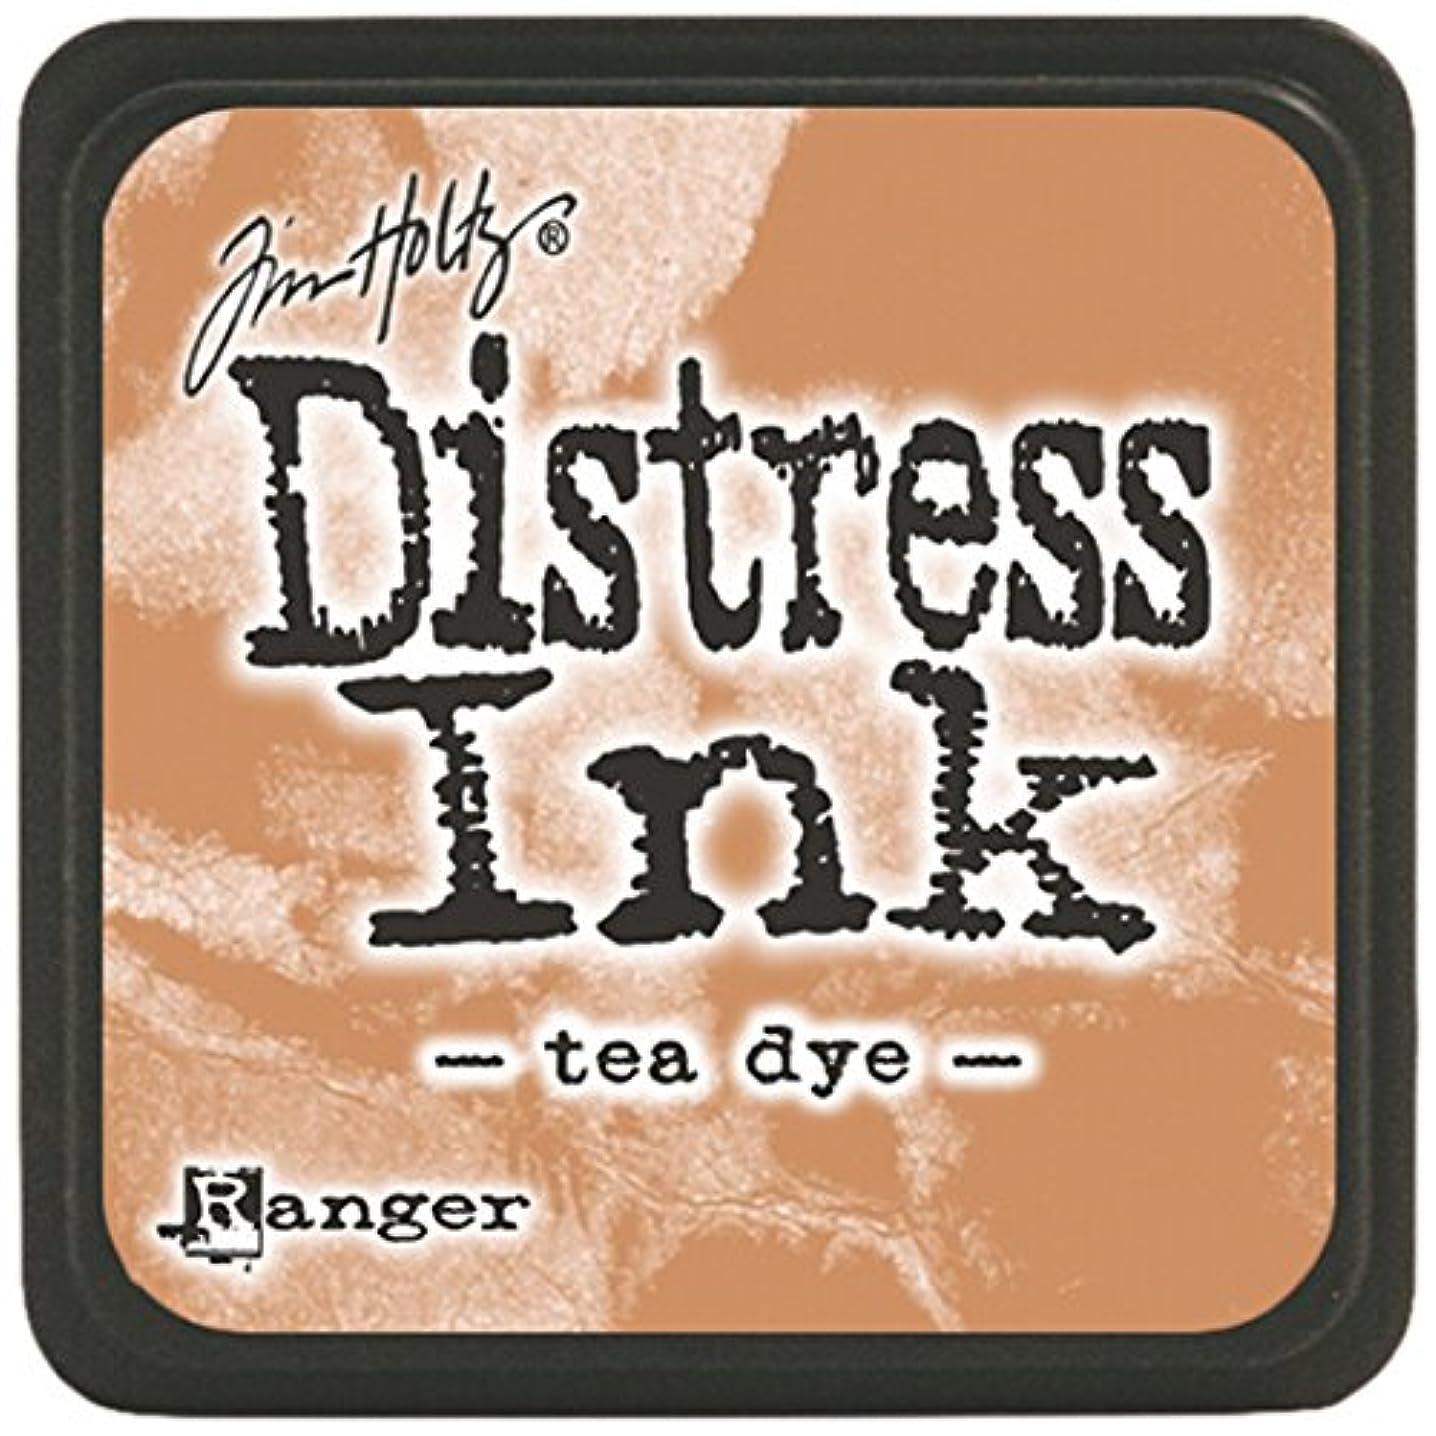 Ranger Tim Holtz Distress Ink Pads, Mini, Tea Dye